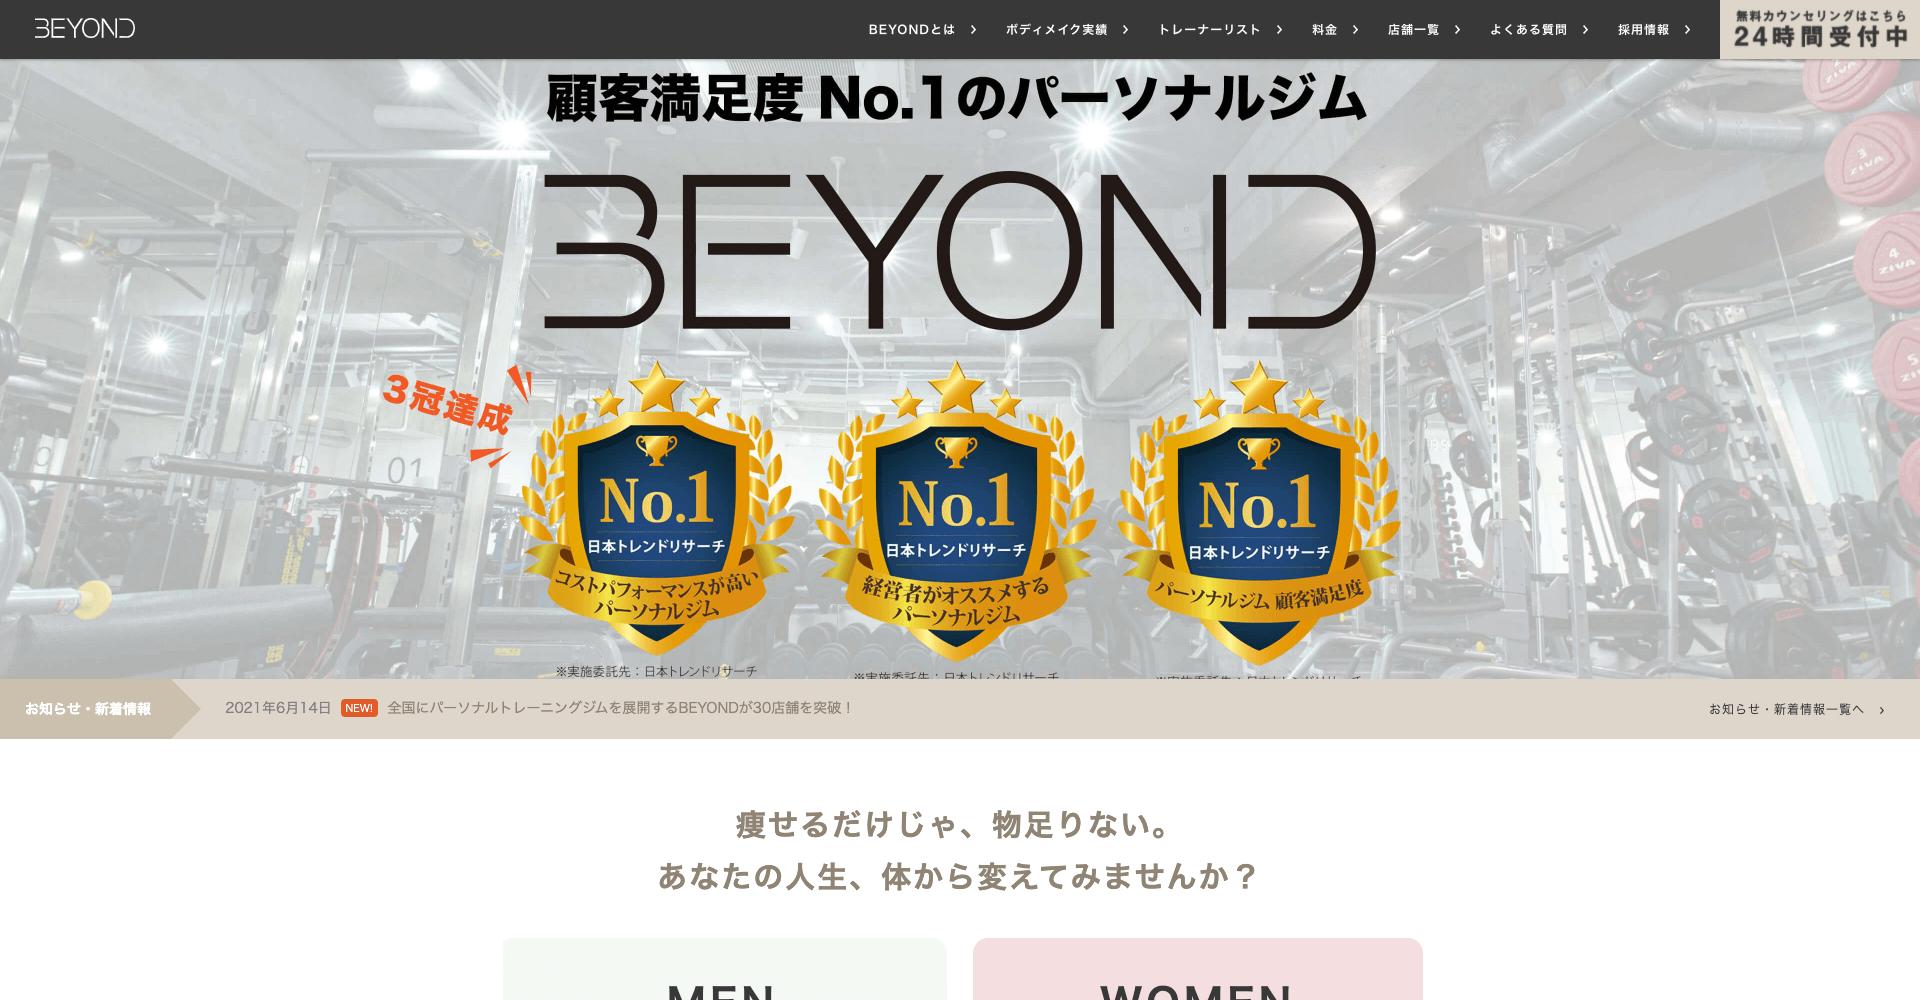 BEYOND(ビヨンド)ジム 新宿ANNEX店